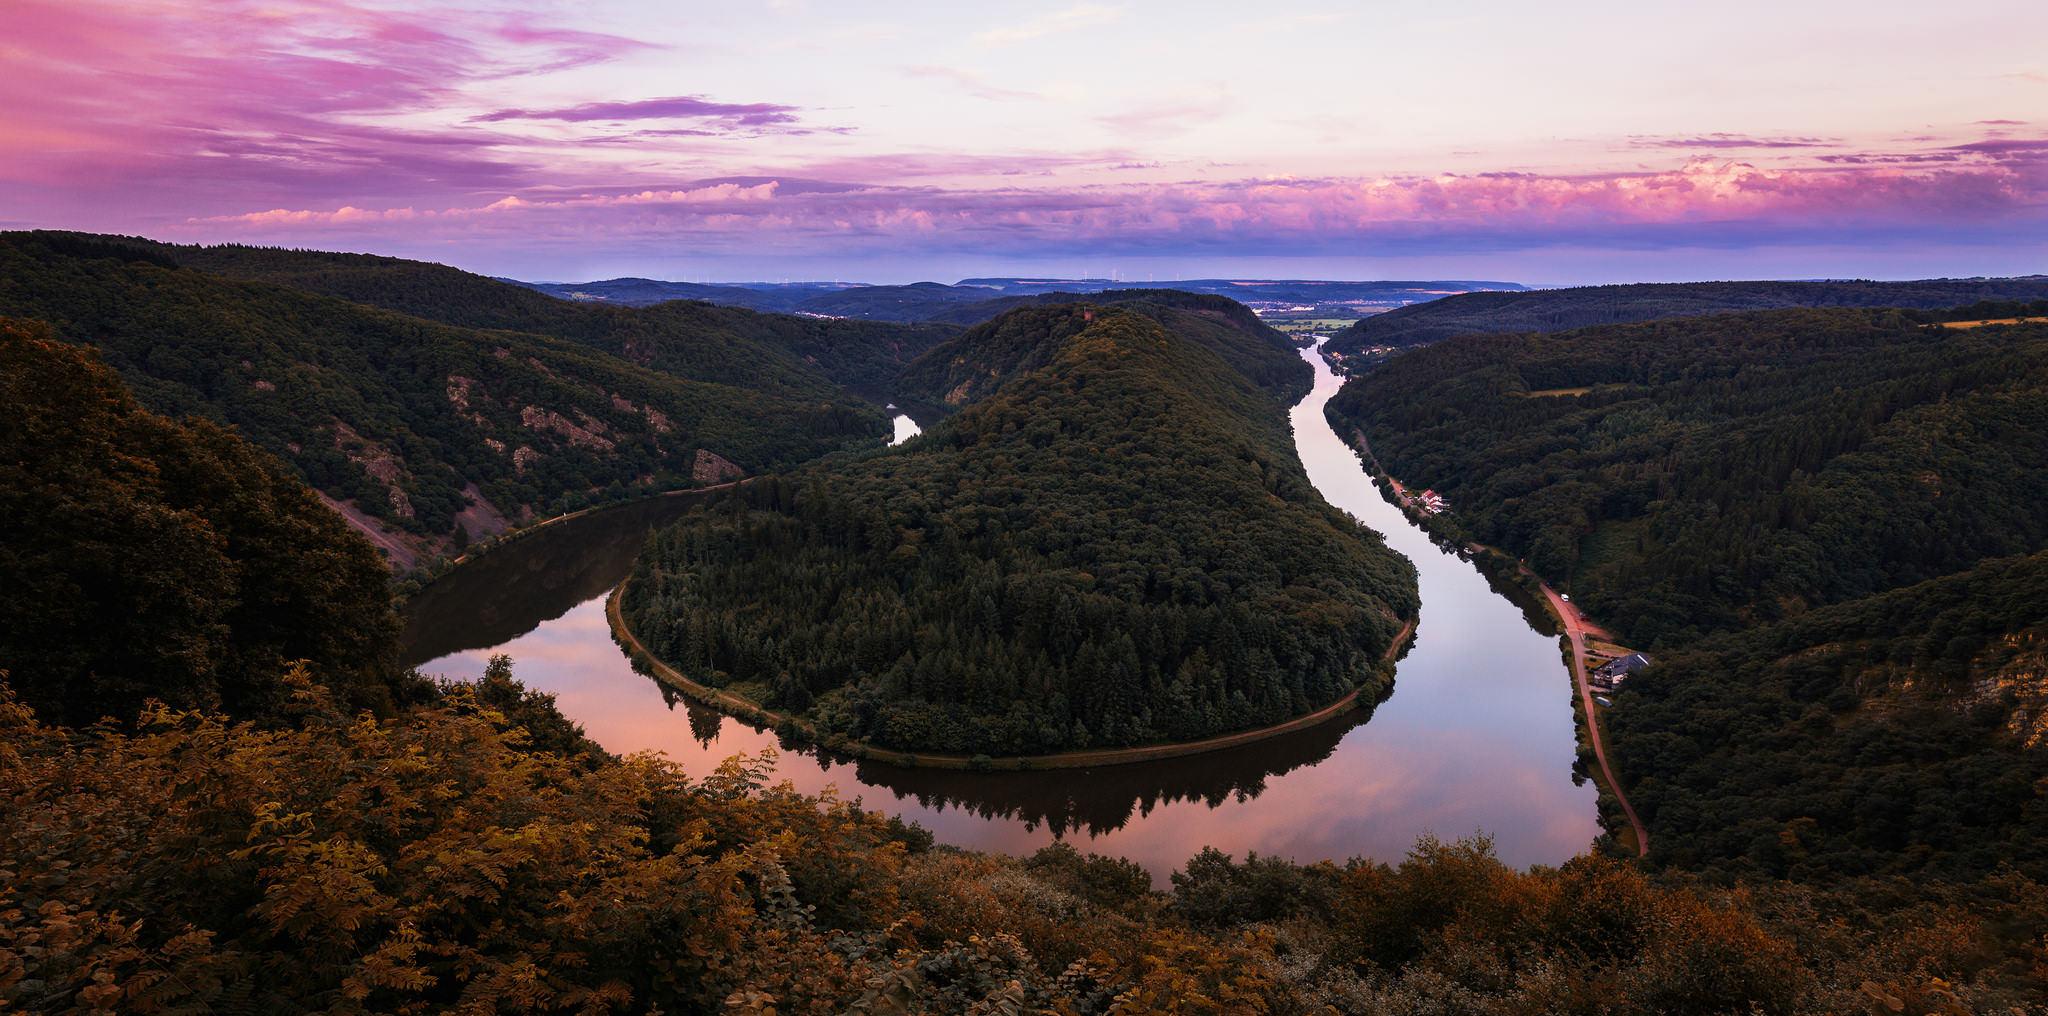 Landschaftsfotografie fotograf filmemacher frankfurt patrick schmetzer drohne landschaft natur 80